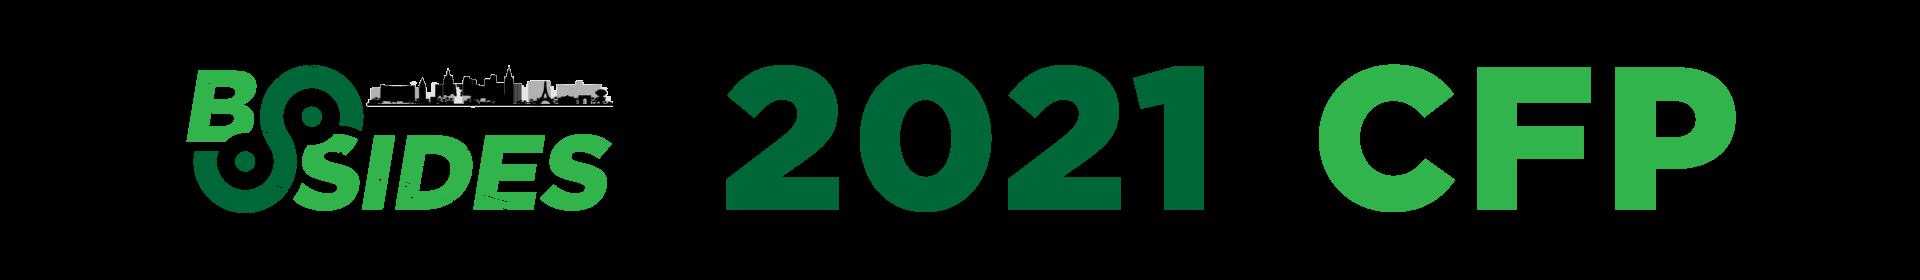 BSides Las Vegas 2021 Event Banner